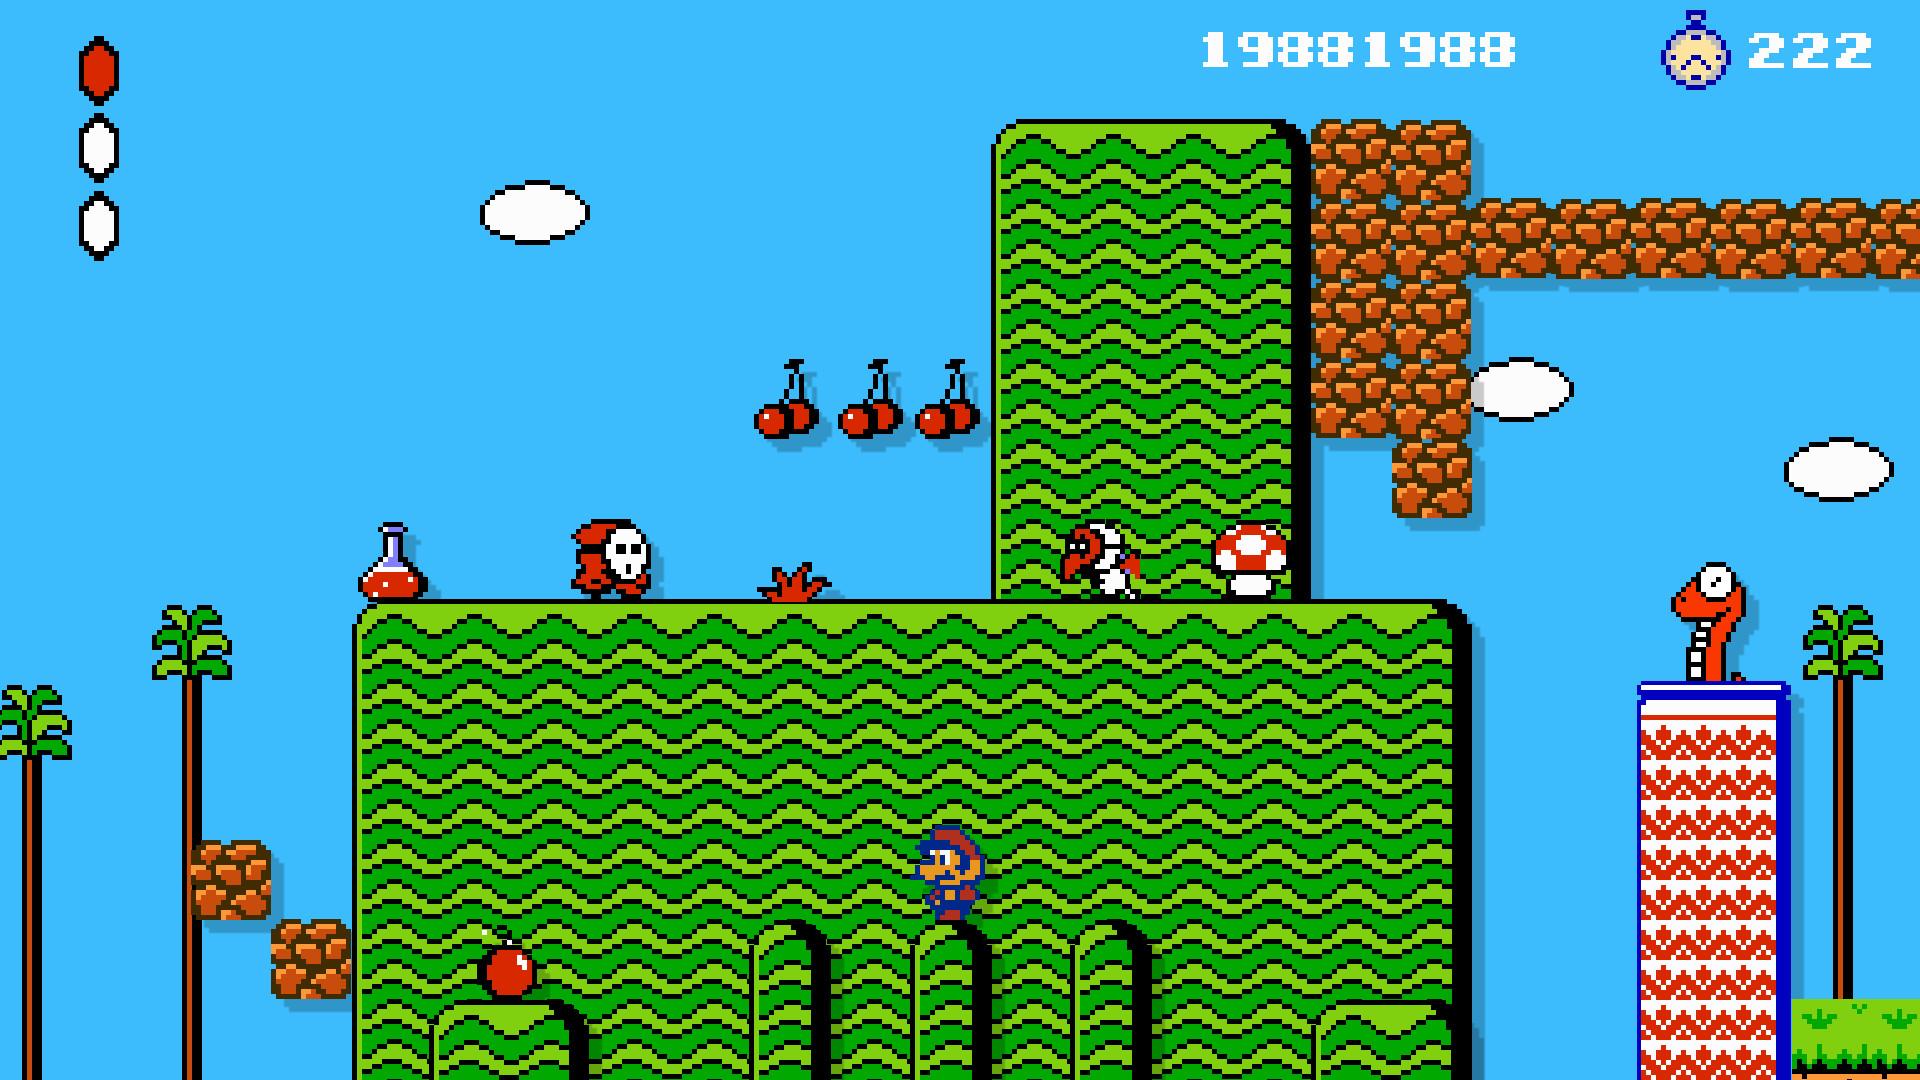 2560x1600 Pixelstalk Wp Content Uploads 2016 04 Super Mario Backgrounds Pictures Images